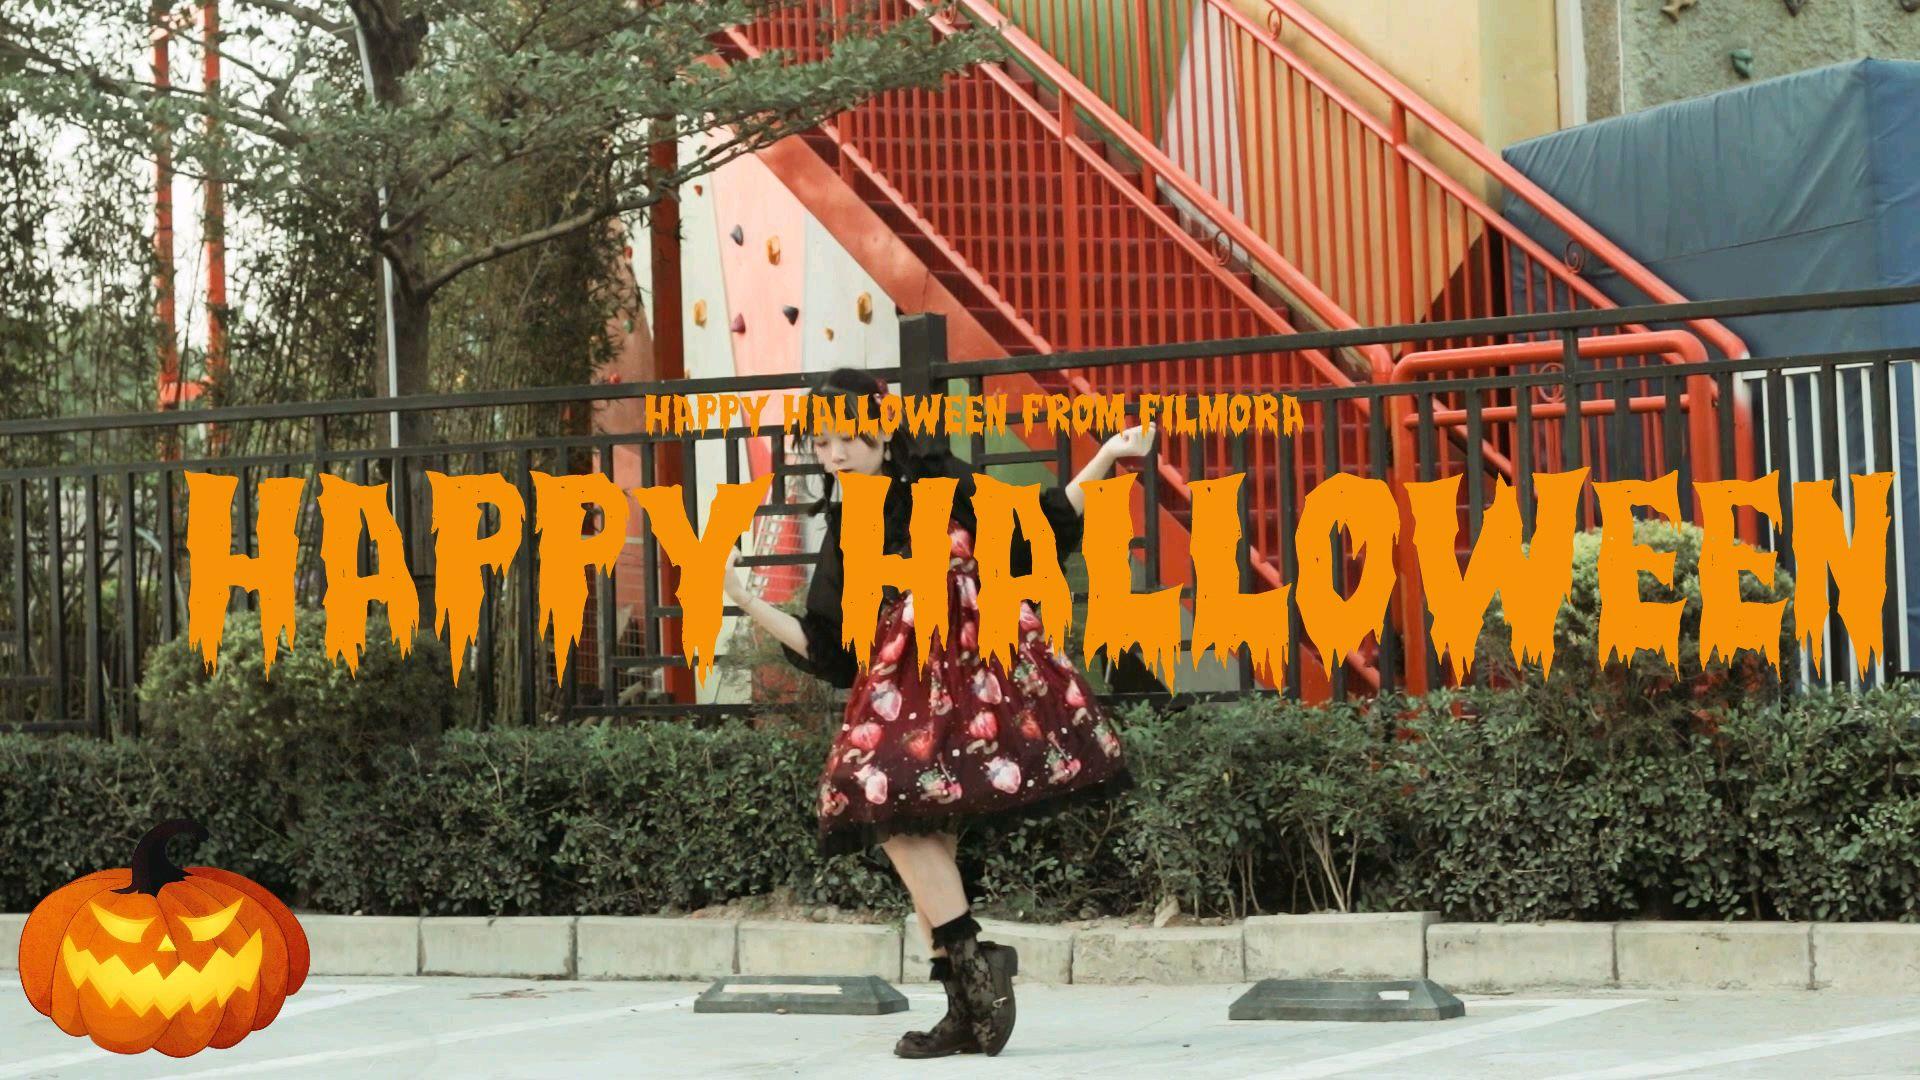 【薇薇】Happy Halloween♡还能骗到糖吗